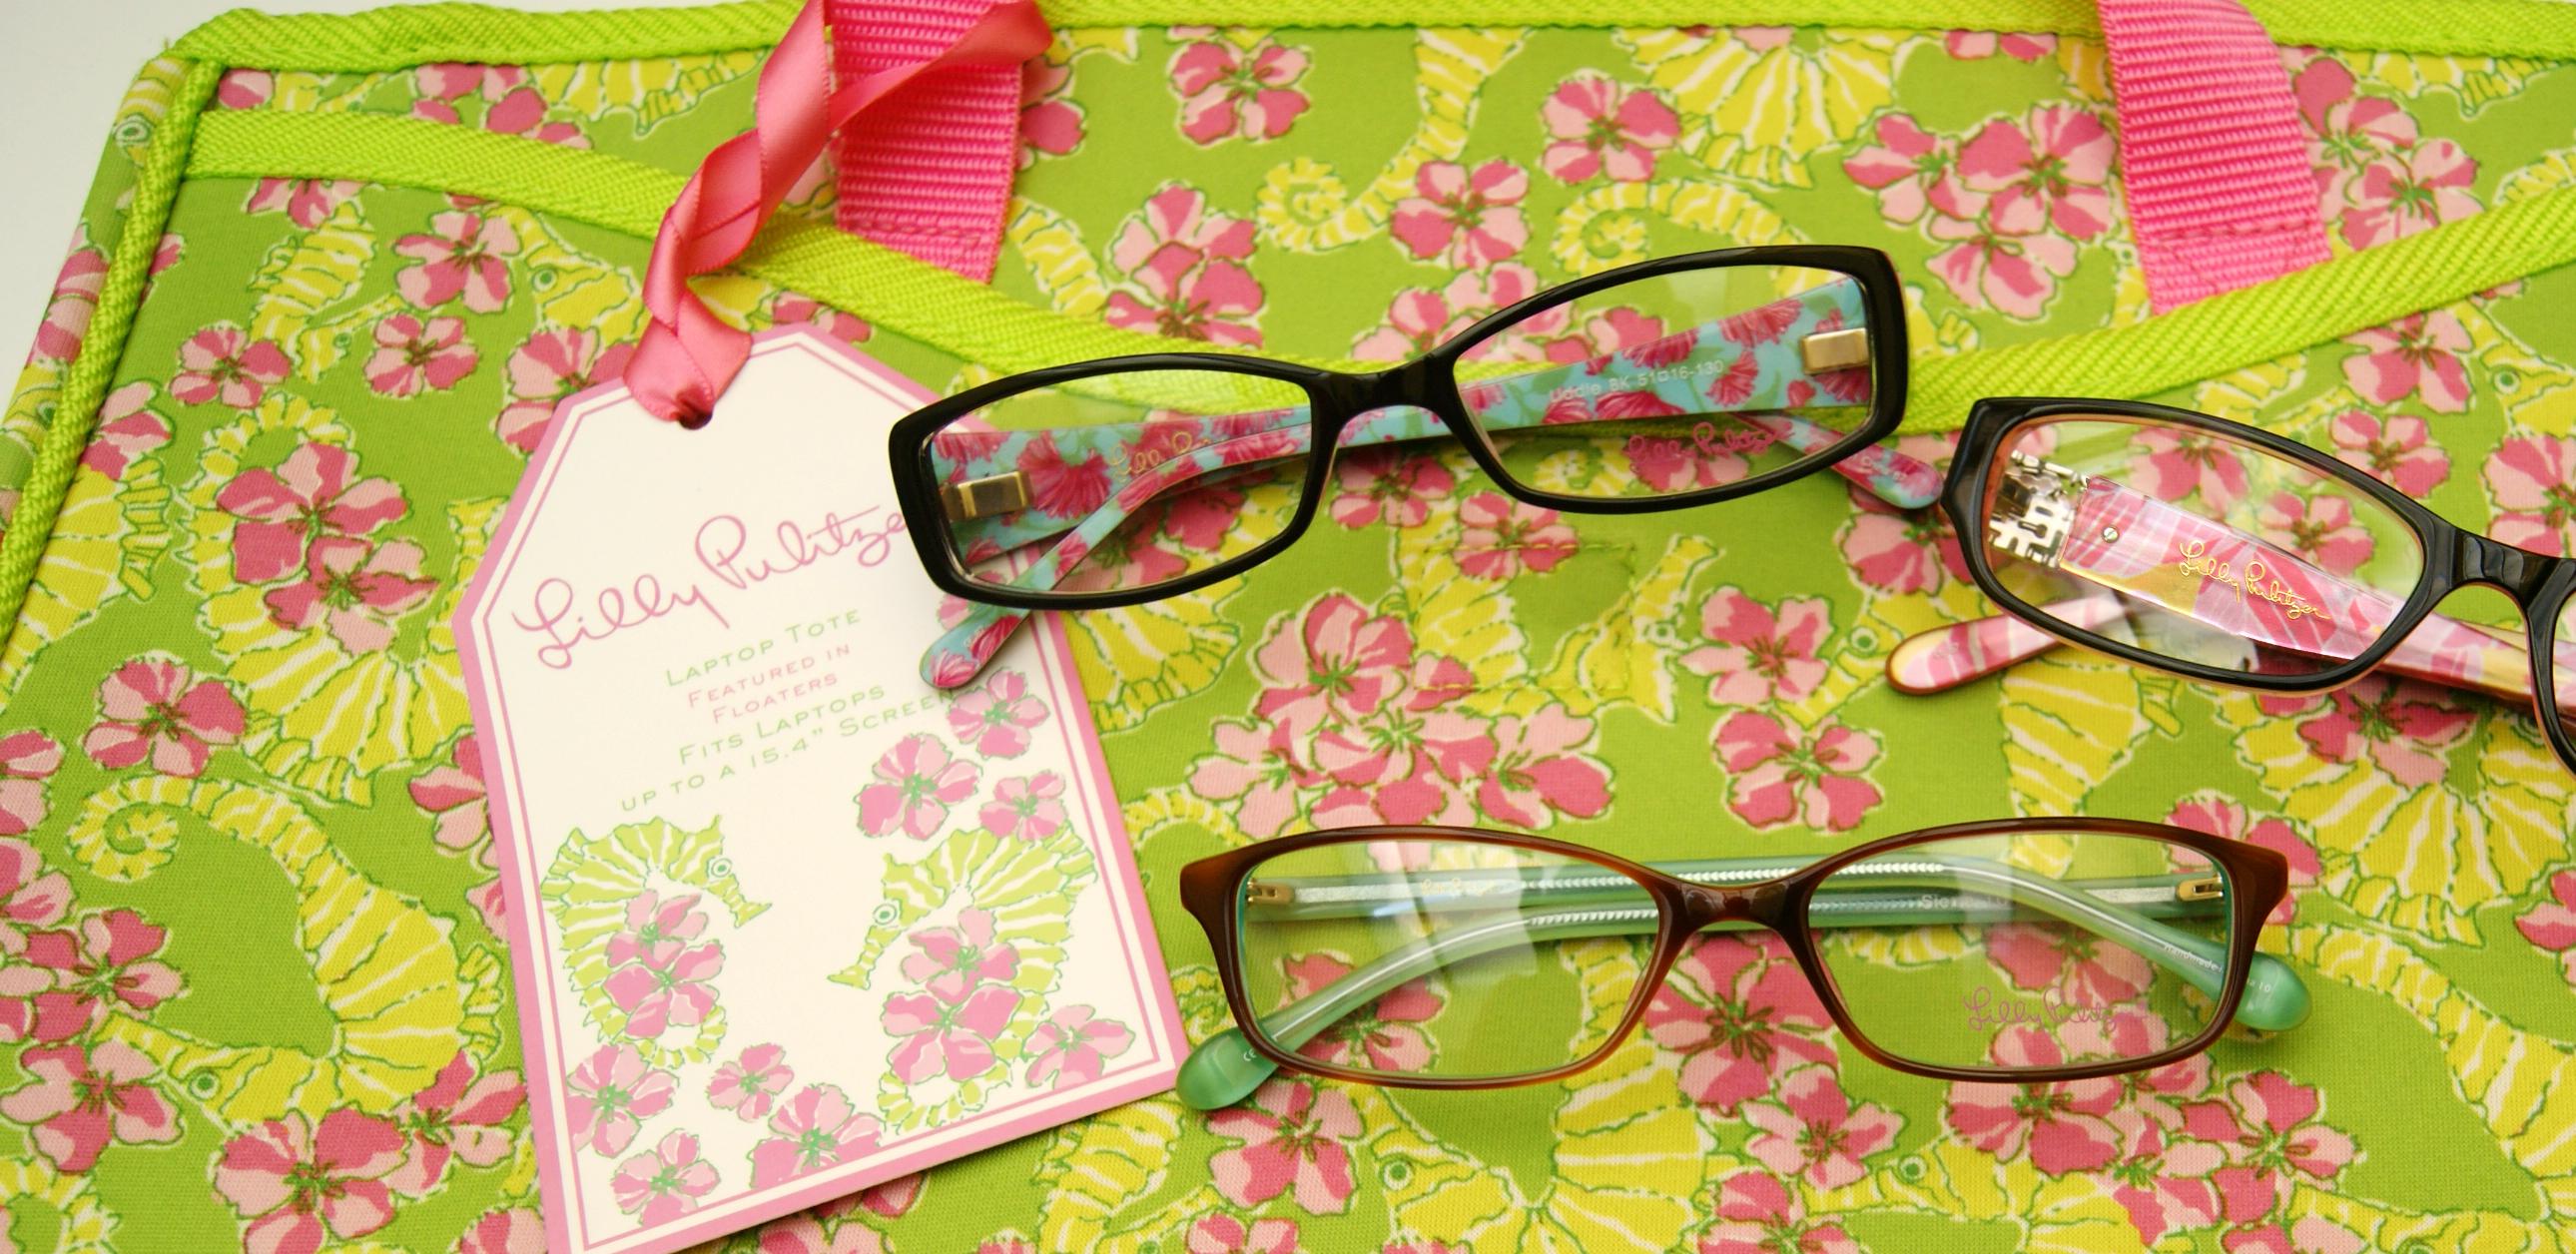 Lilly Pulitzer Fall 2011 Eyewear and Accessories | Haddonfield Eyewear